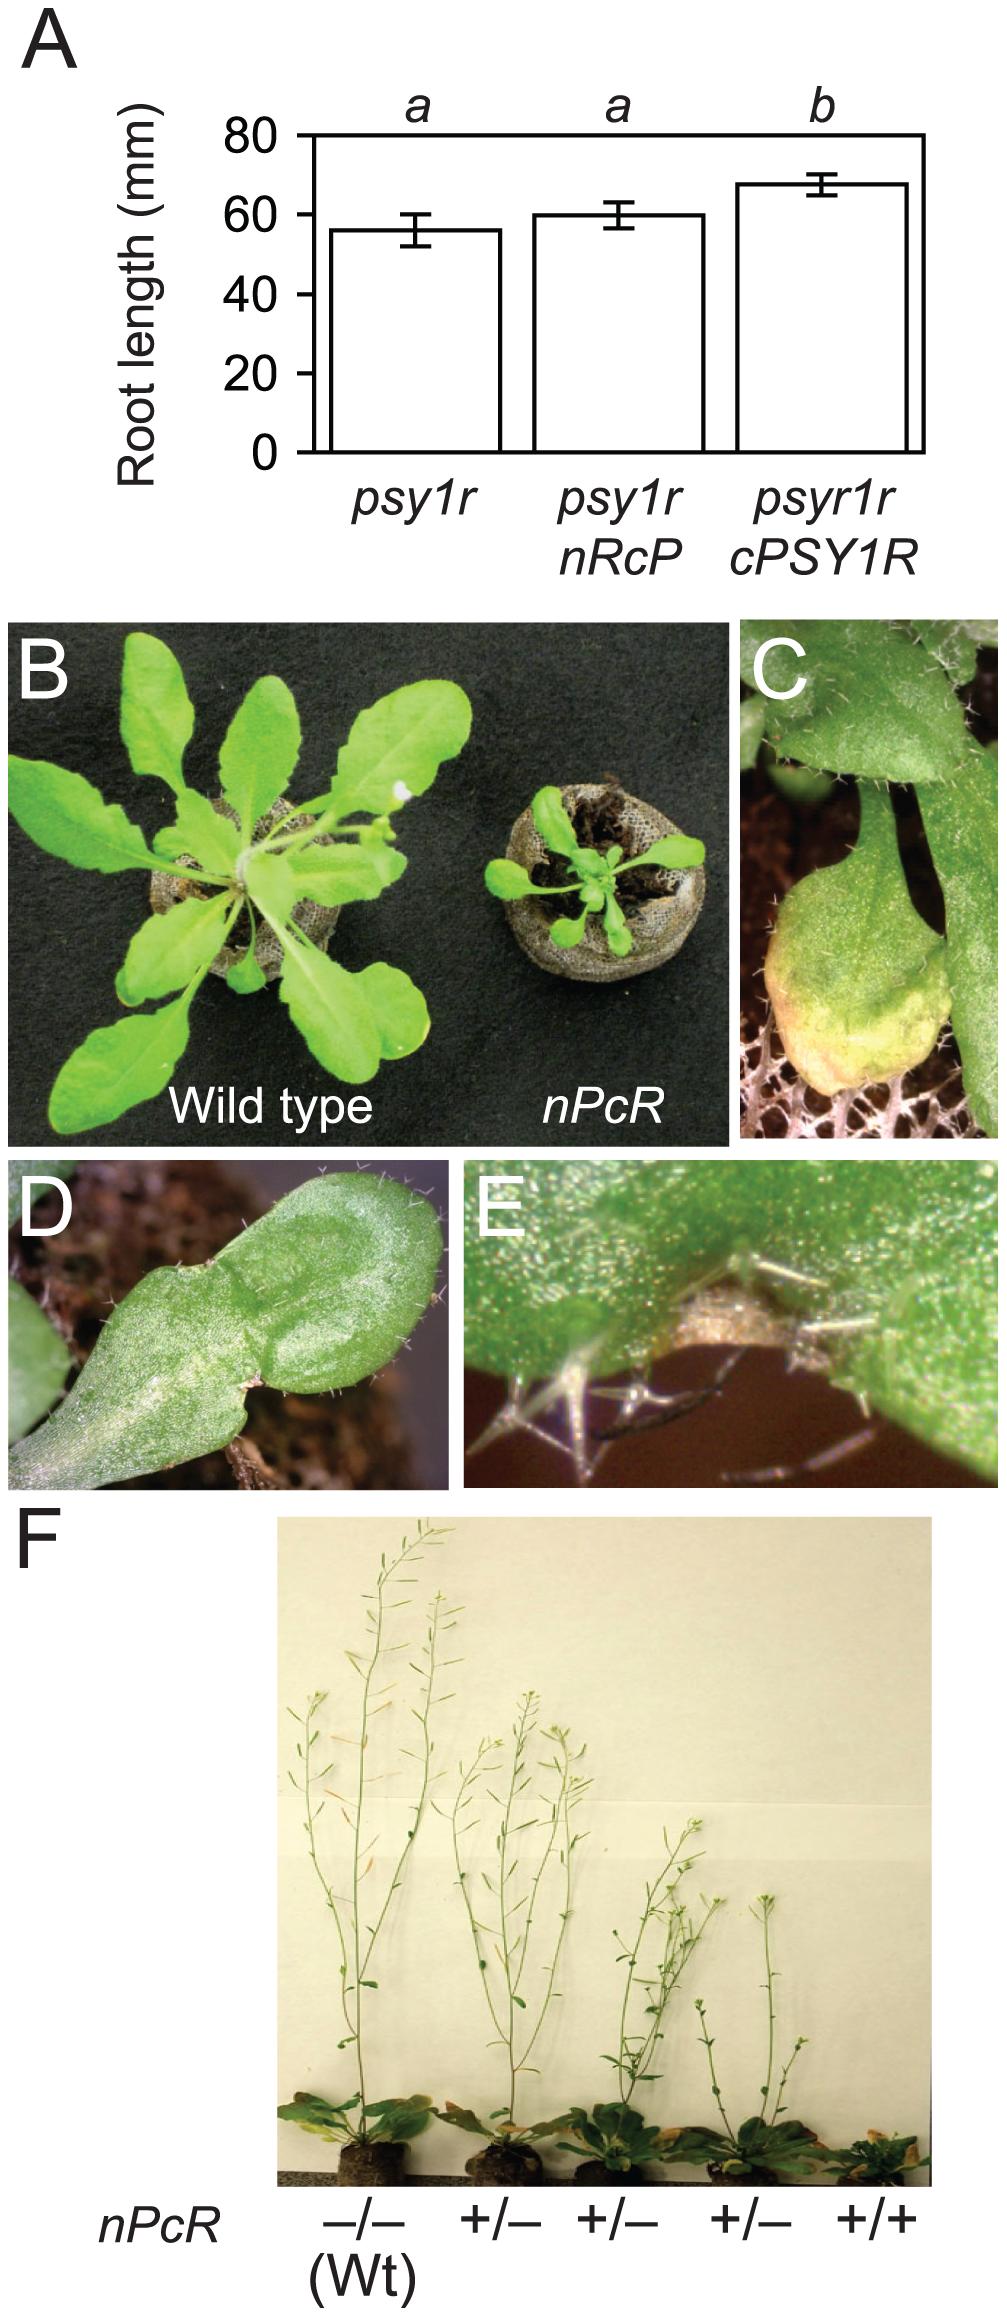 Phenotypes of <i>cRFO2</i> and <i>cPSY1R</i> chimeric RLP and RLK genes.